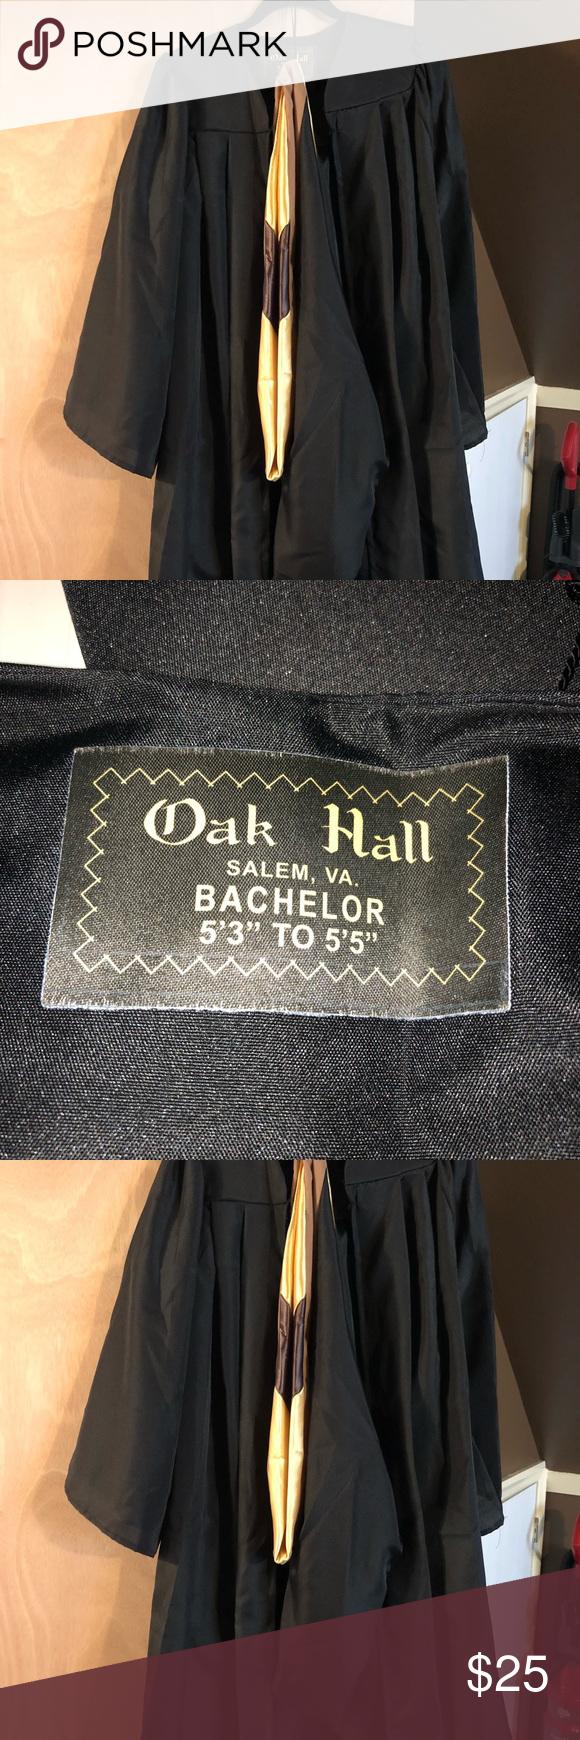 Oak hall bachelors graduation gown | My Posh Closet | Pinterest ...